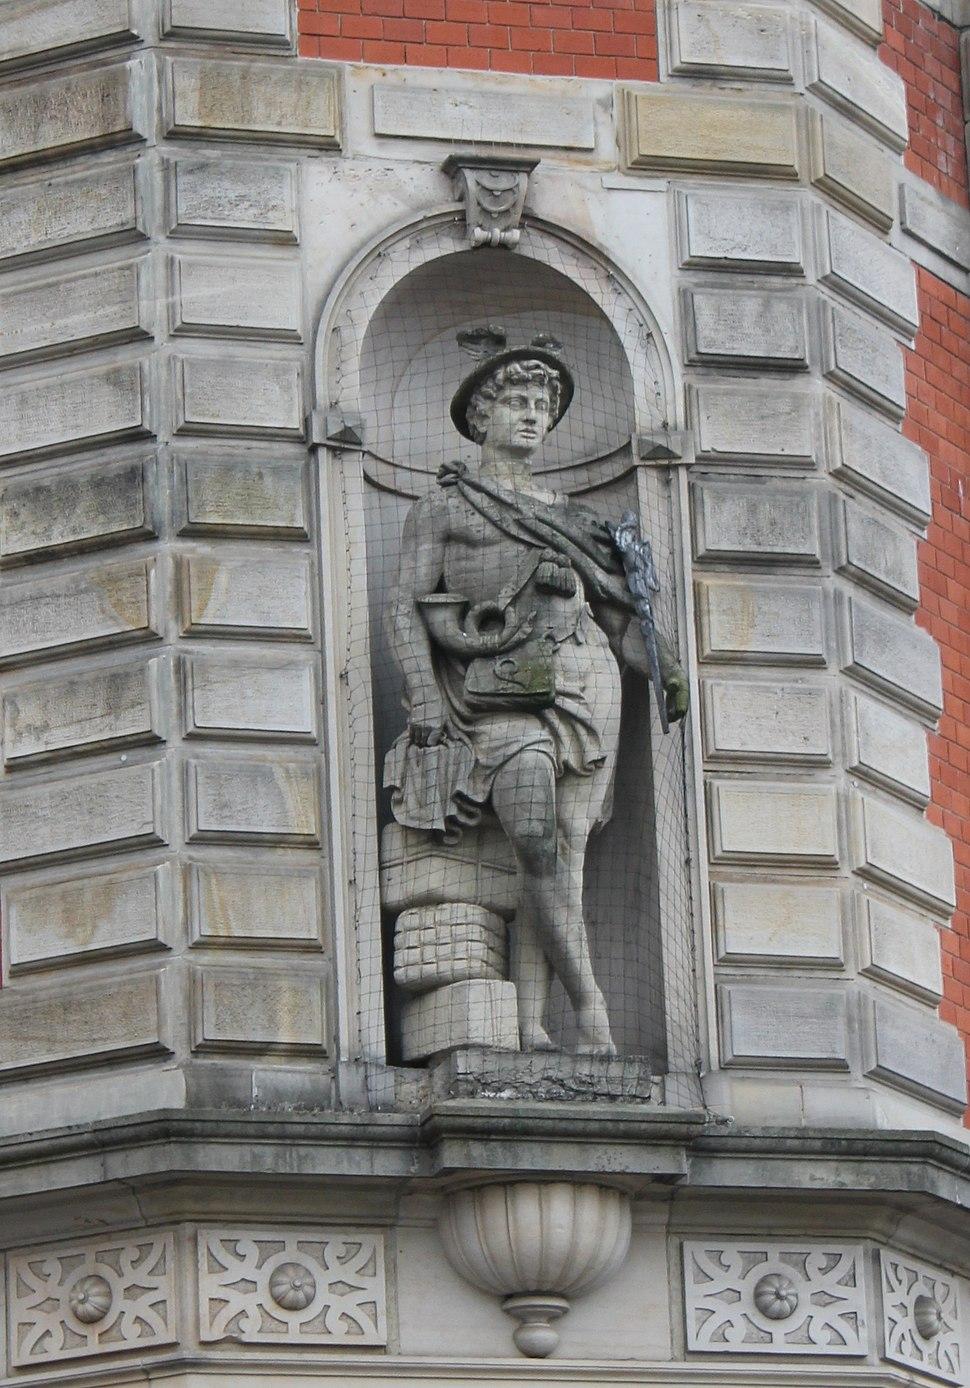 Hermes-Figur an der Alten Post (Flensburg)